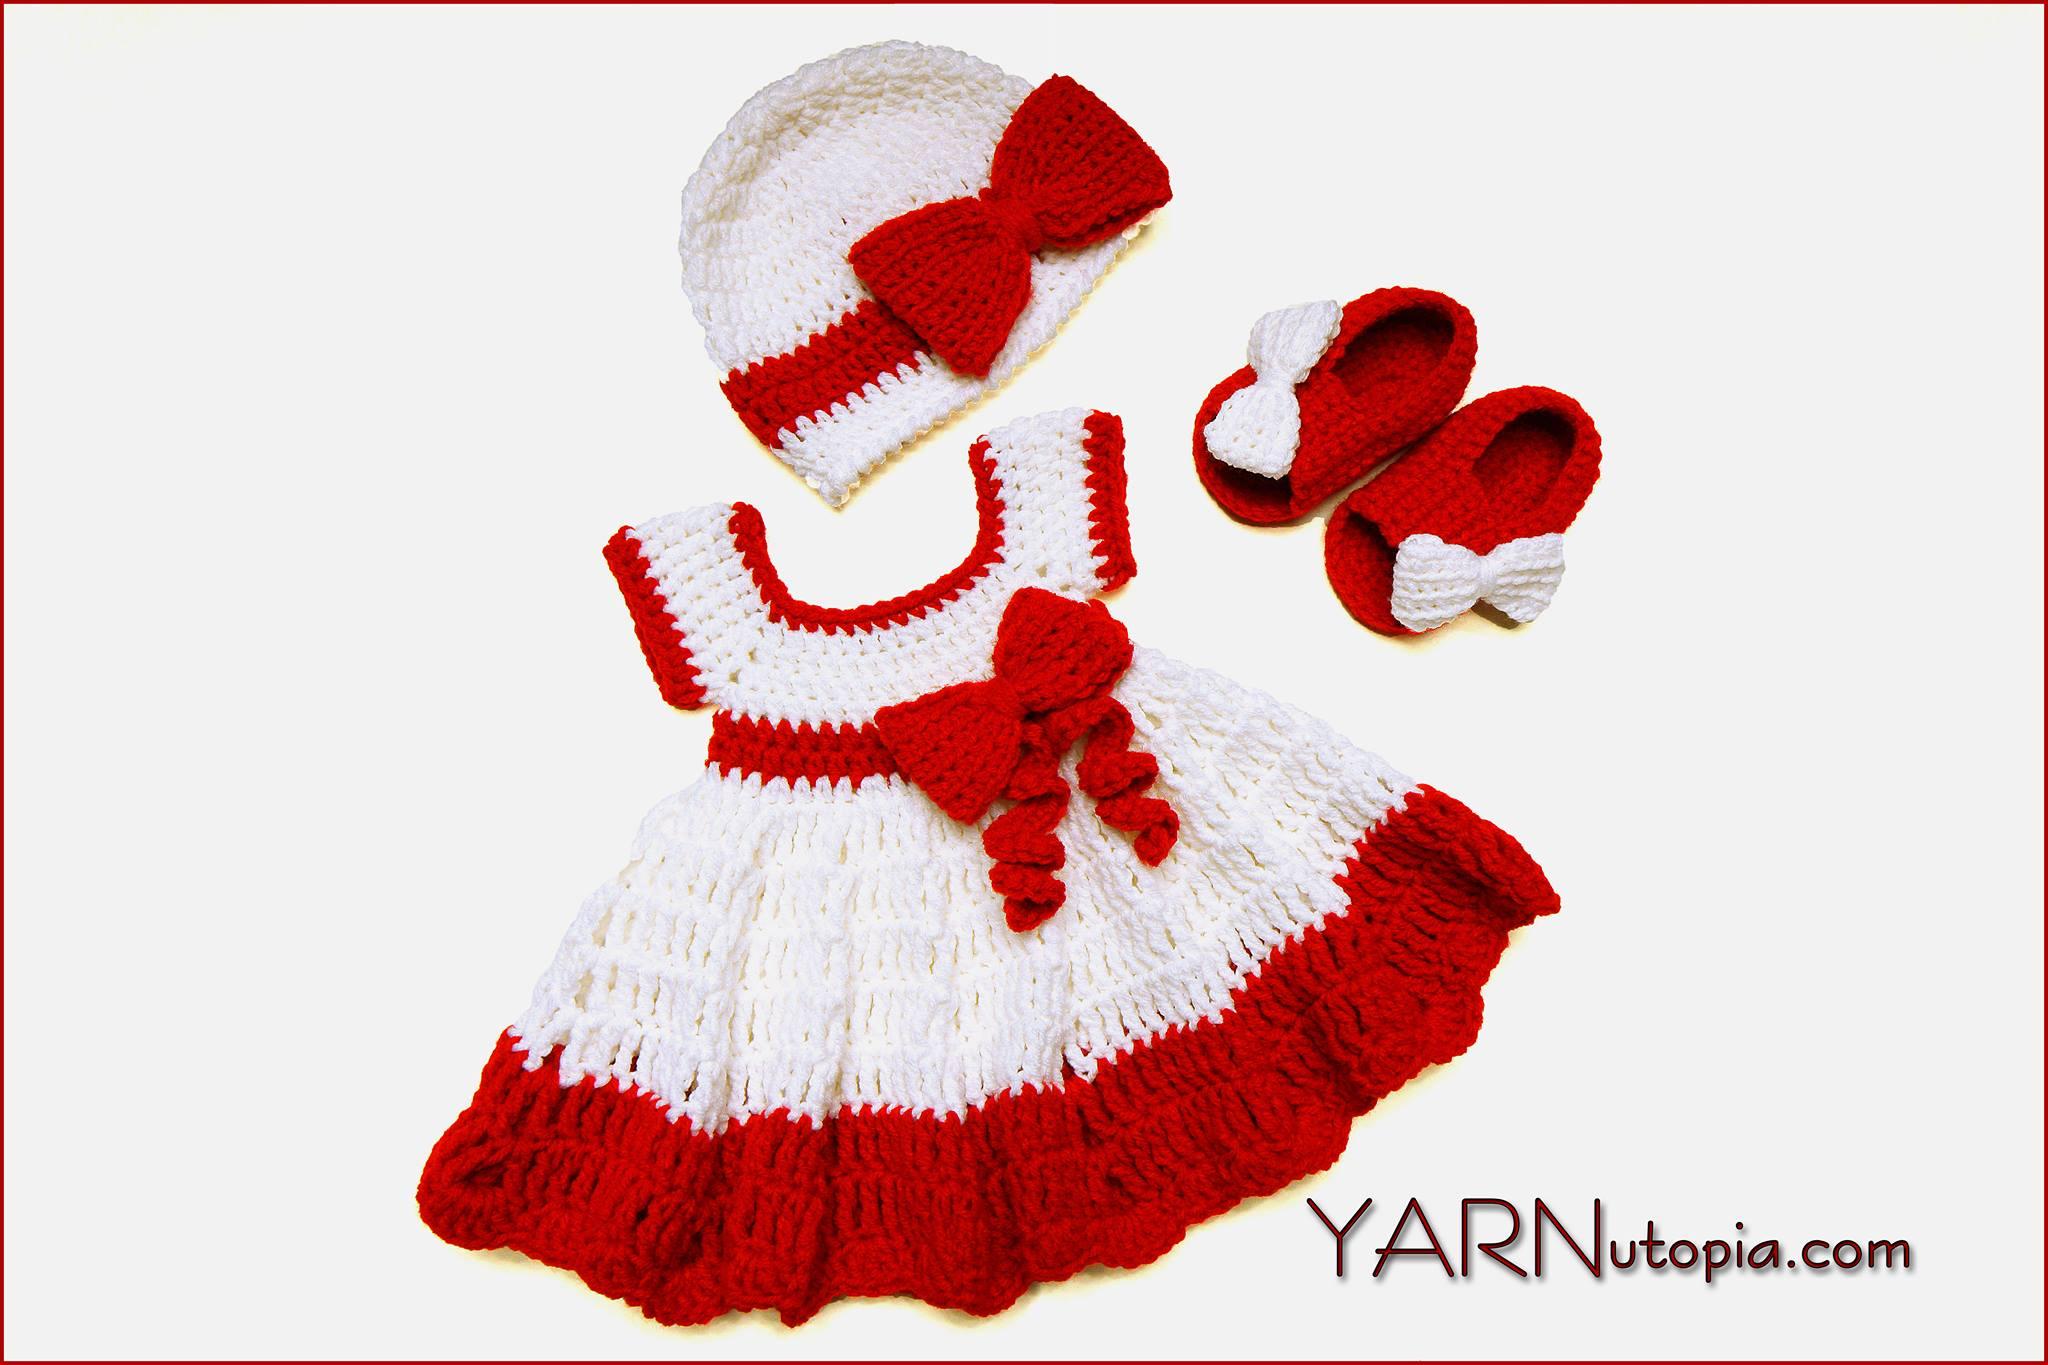 crochet baby dress « YARNutopia by Nadia Fuad